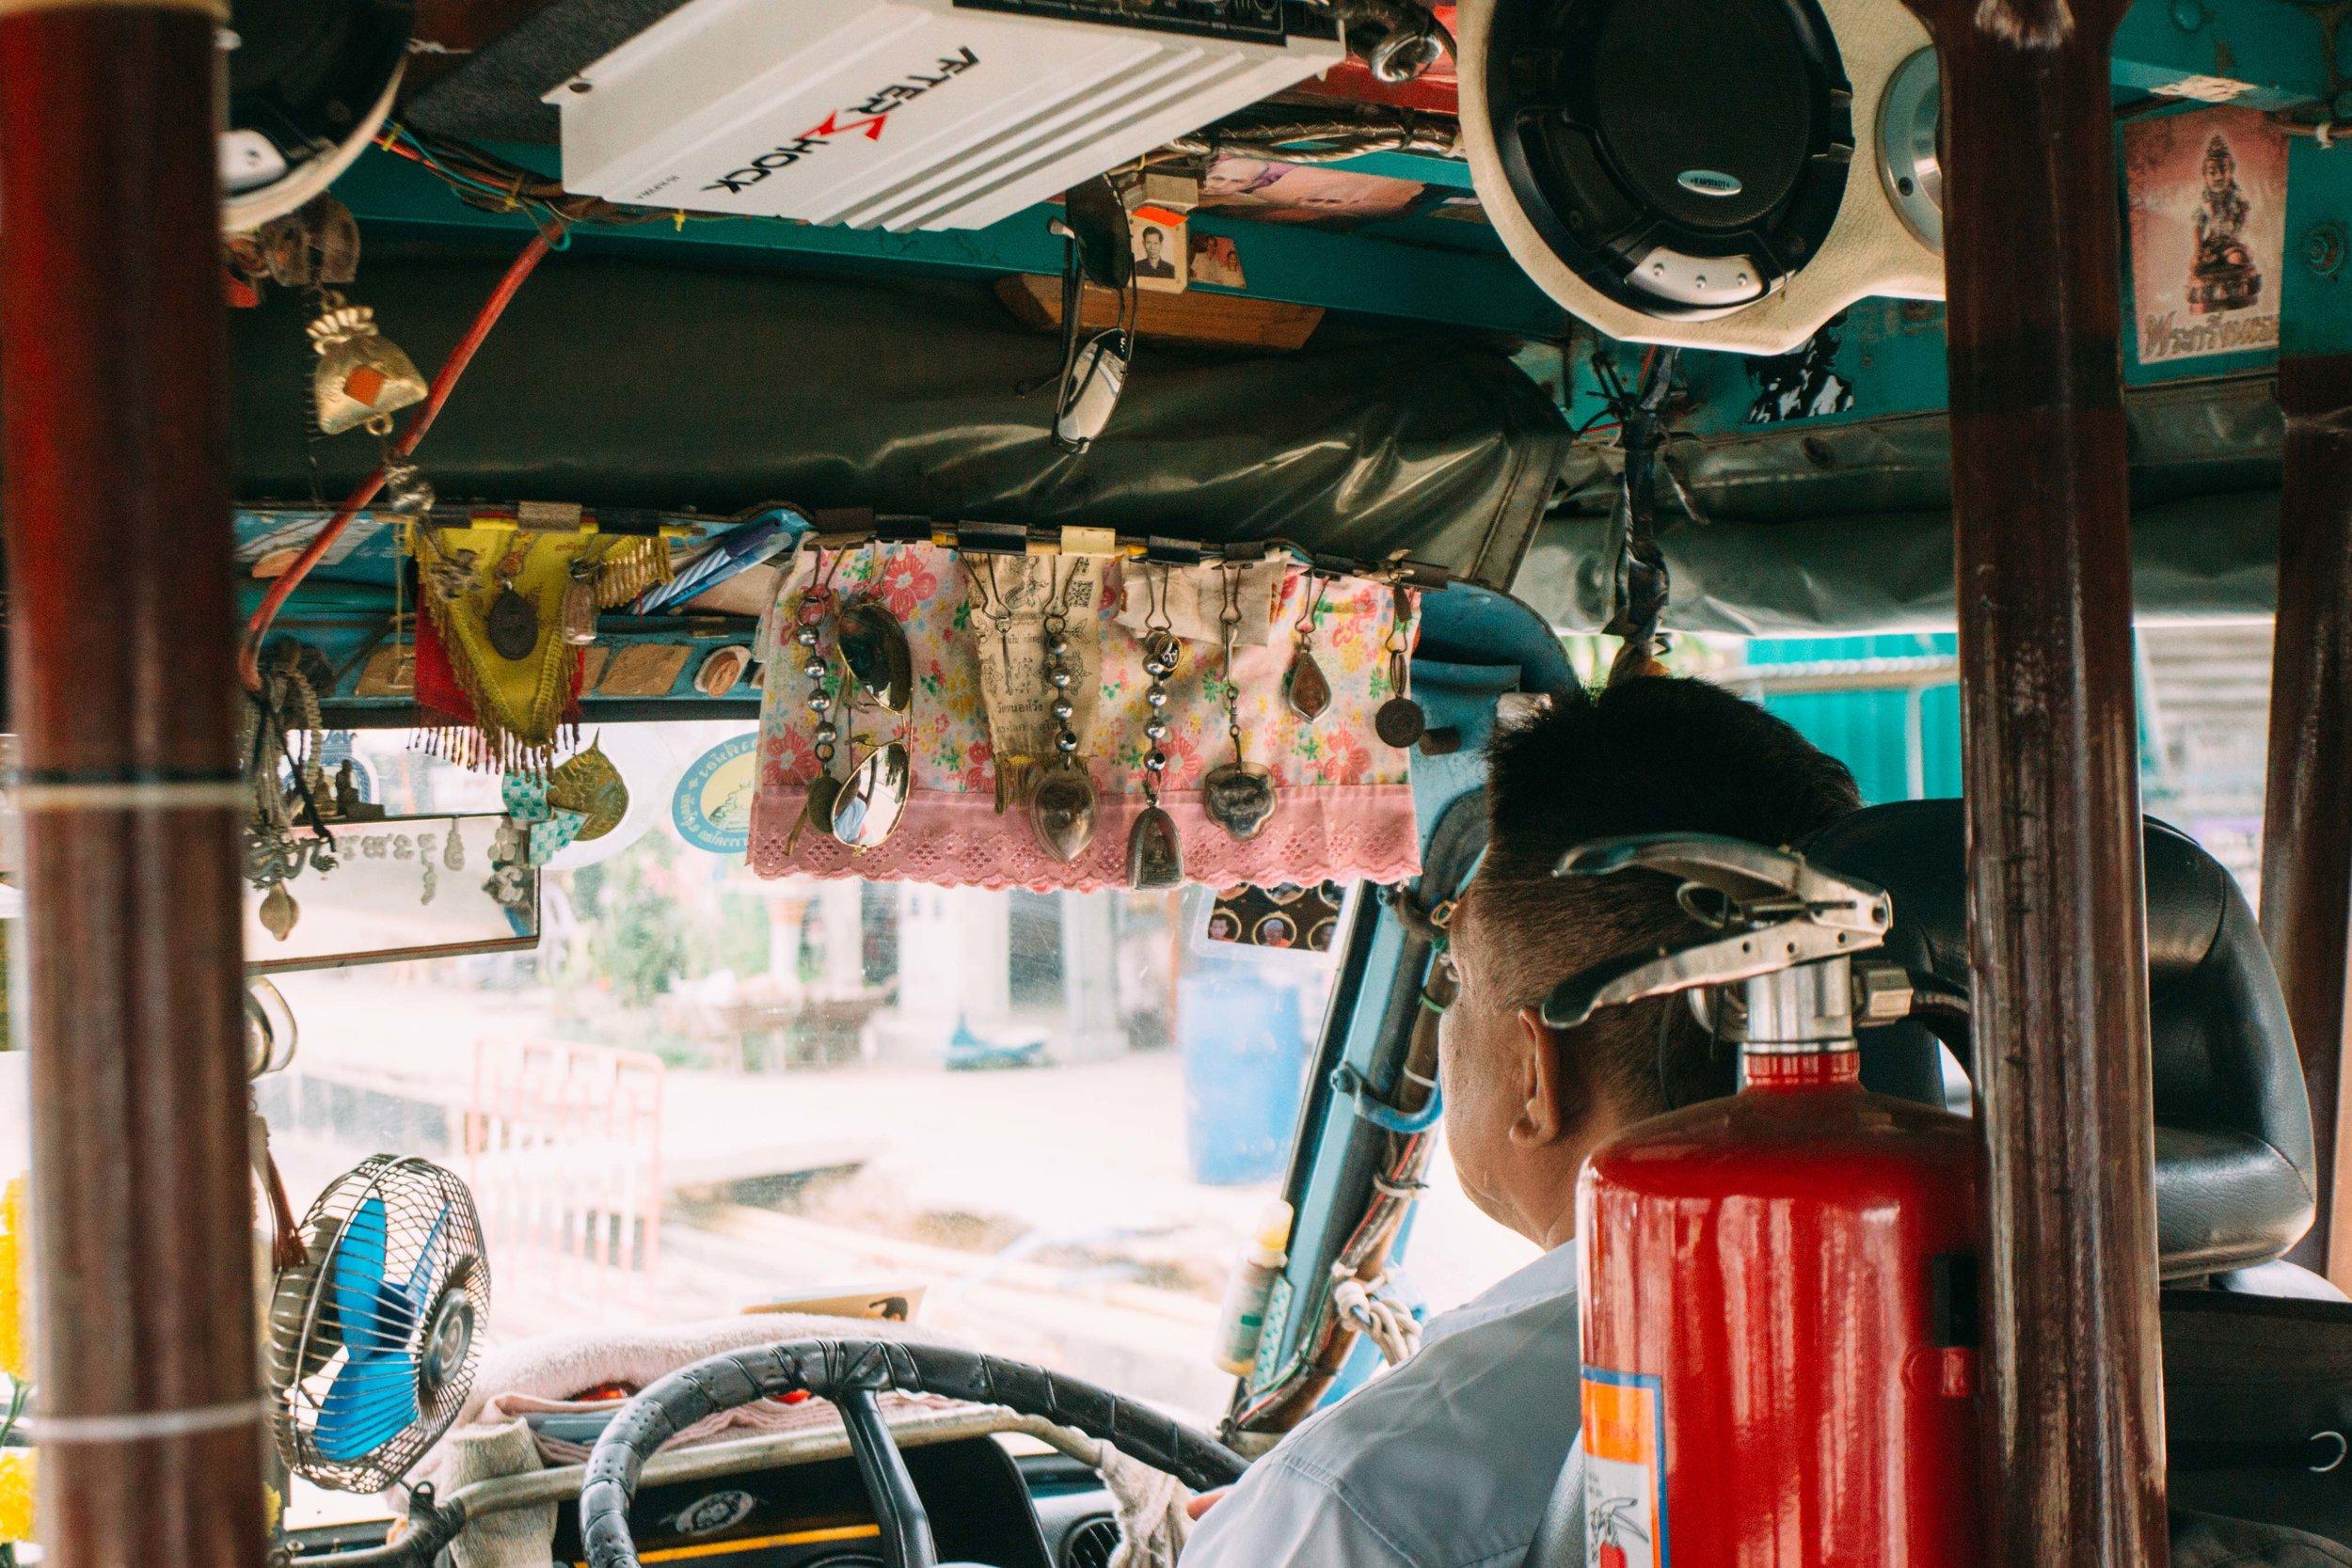 fazer sukhothai roteiro tailandia